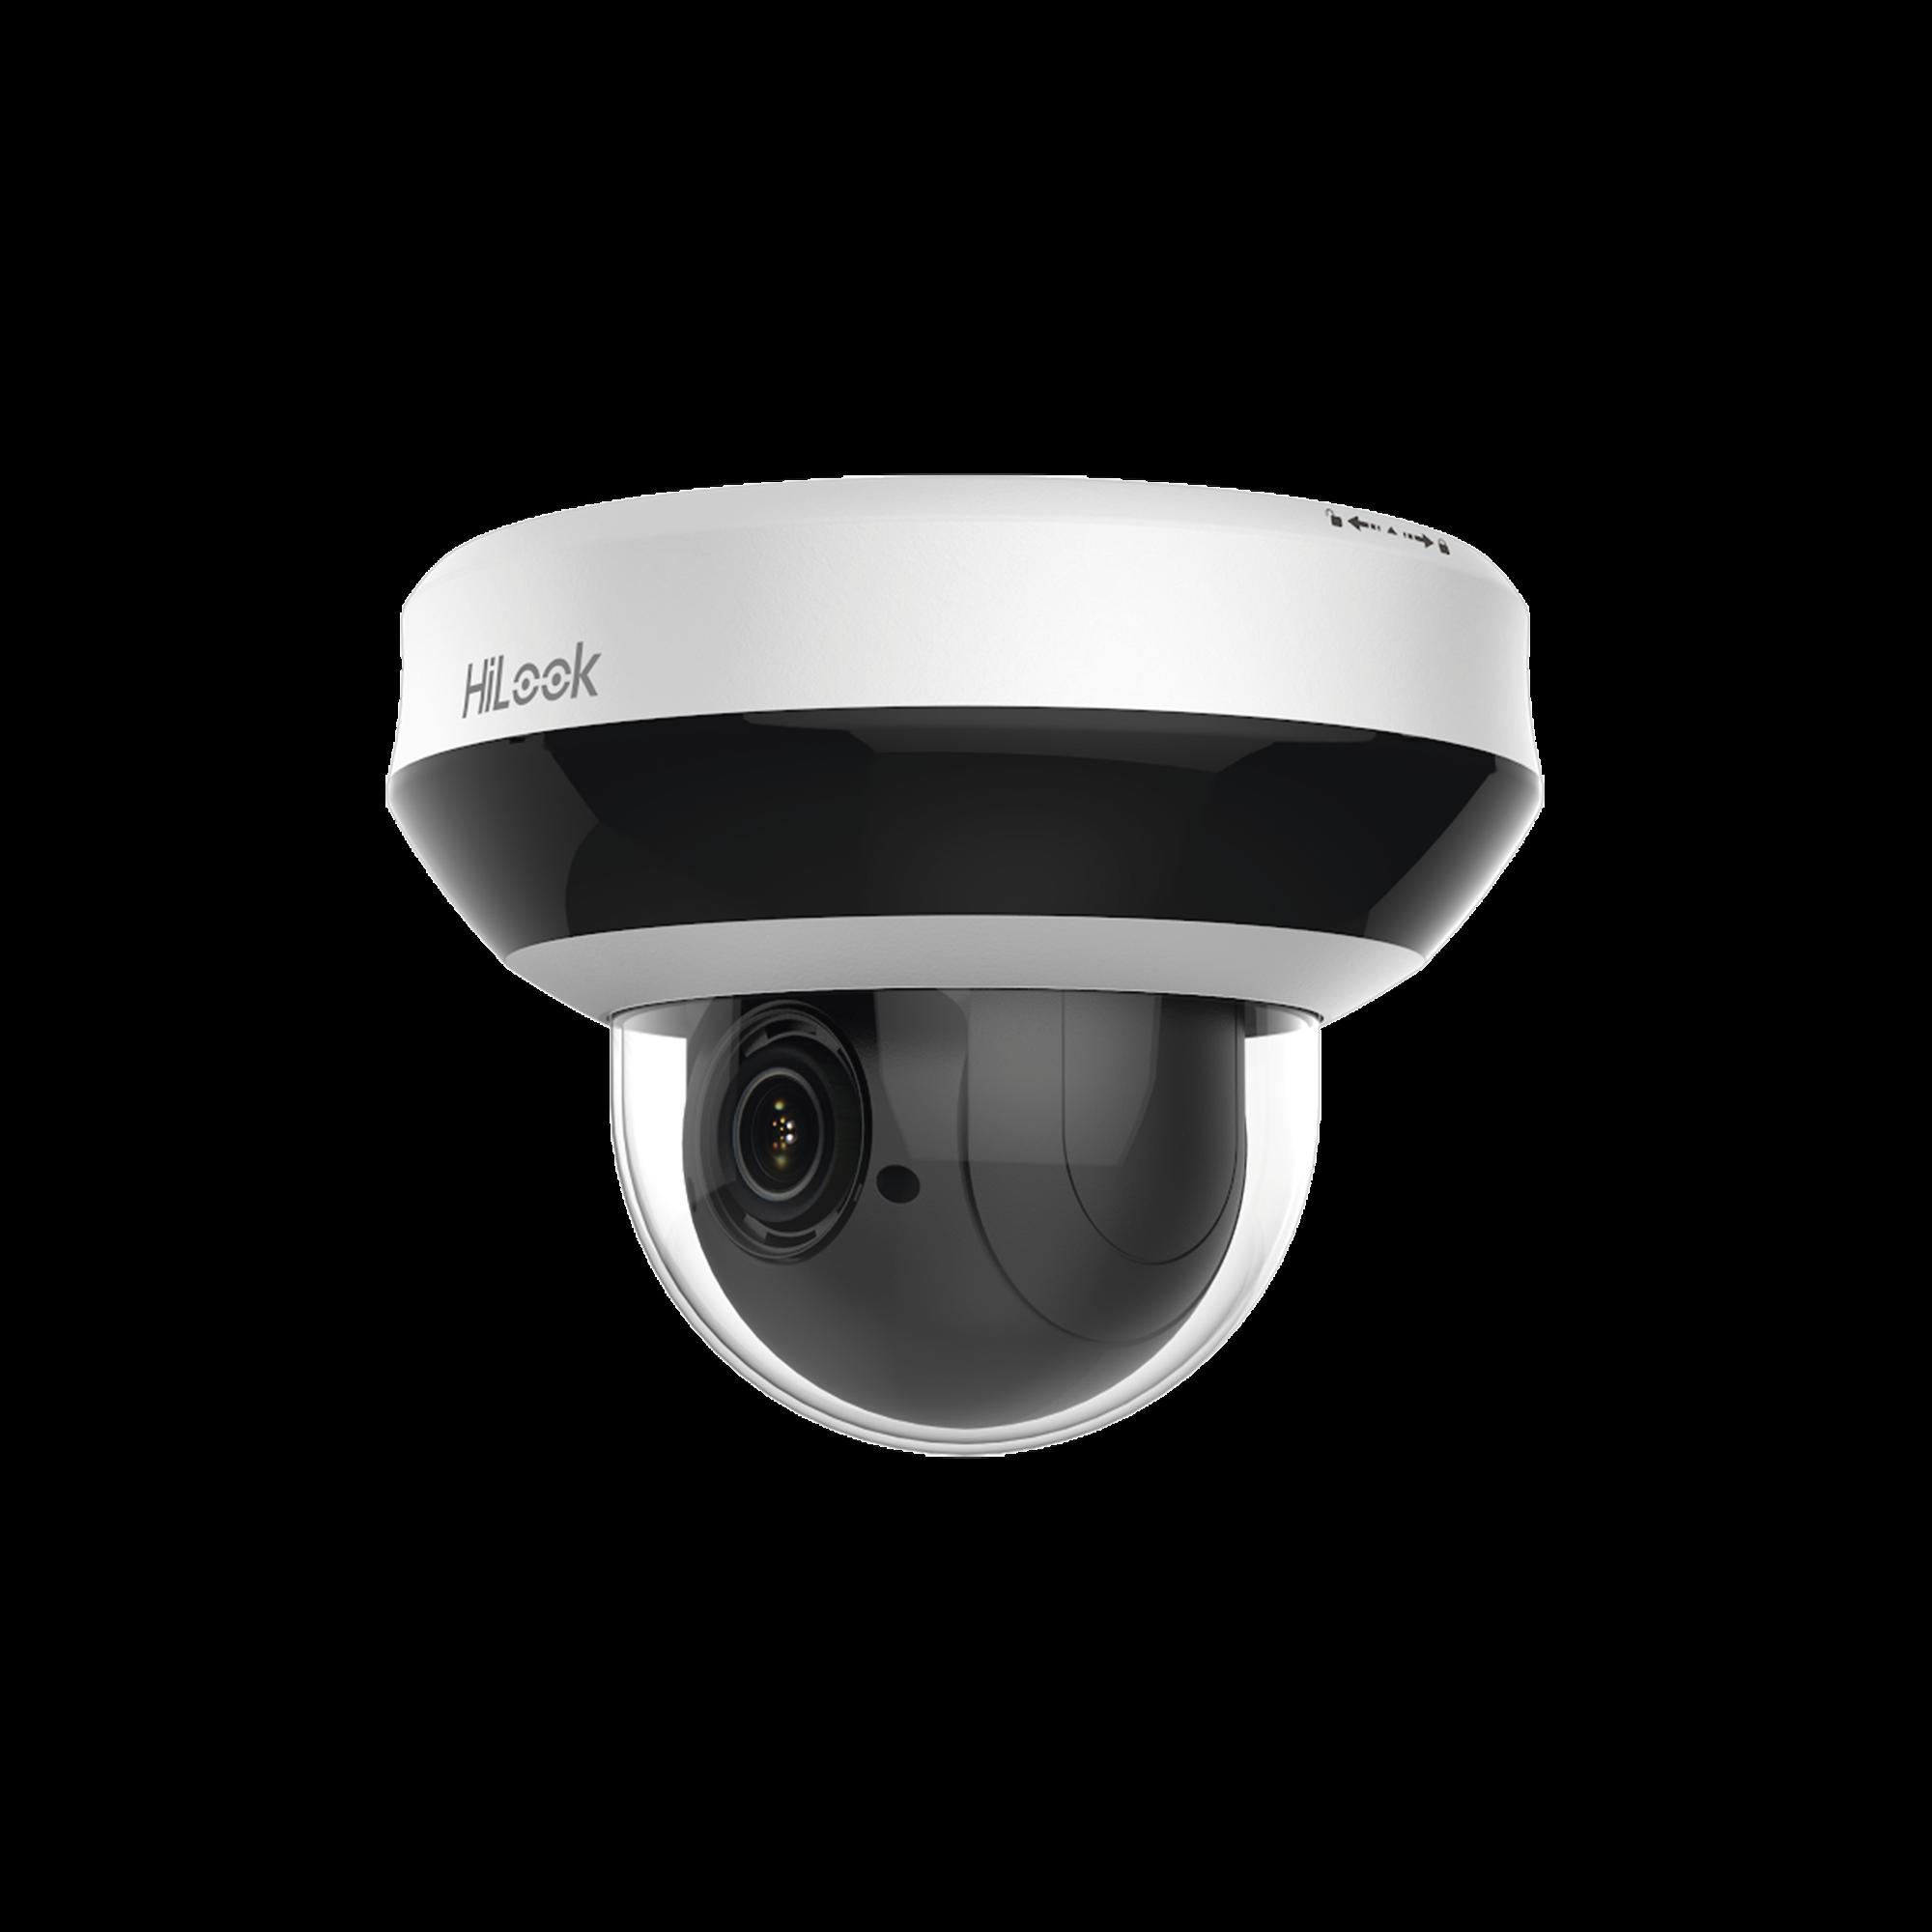 Mini PTZ IP 4 Megapixel / 4X Zoom / H.265+ / 20 mts IR EXIR / WDR / PoE / IK10 / IP66 / Ultra Baja Iluminación